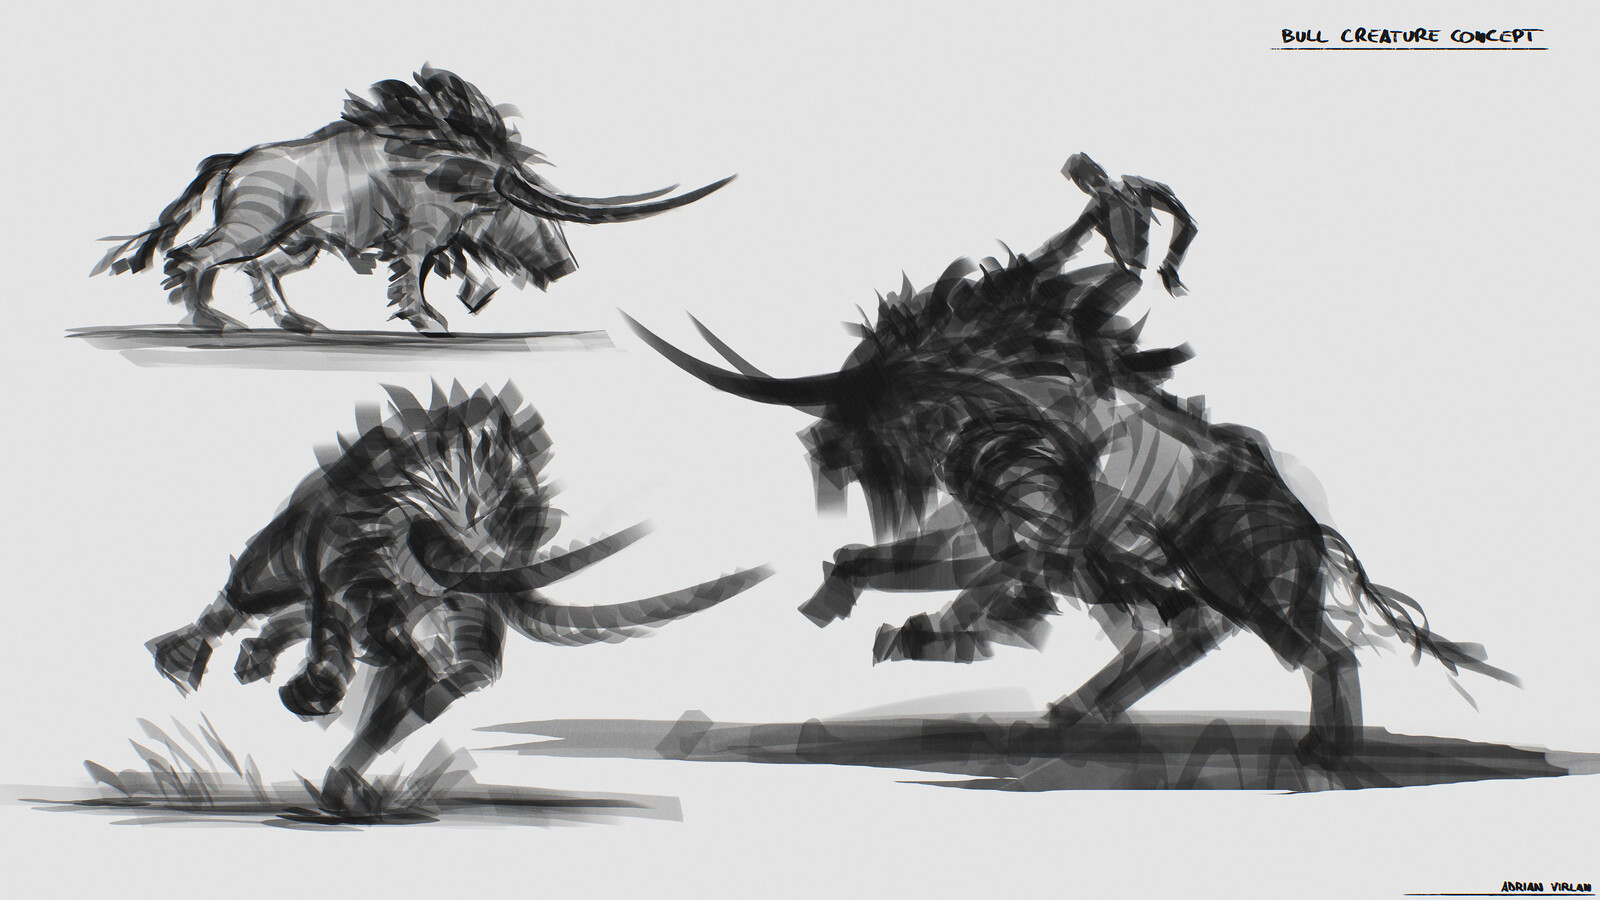 Bull creature concept